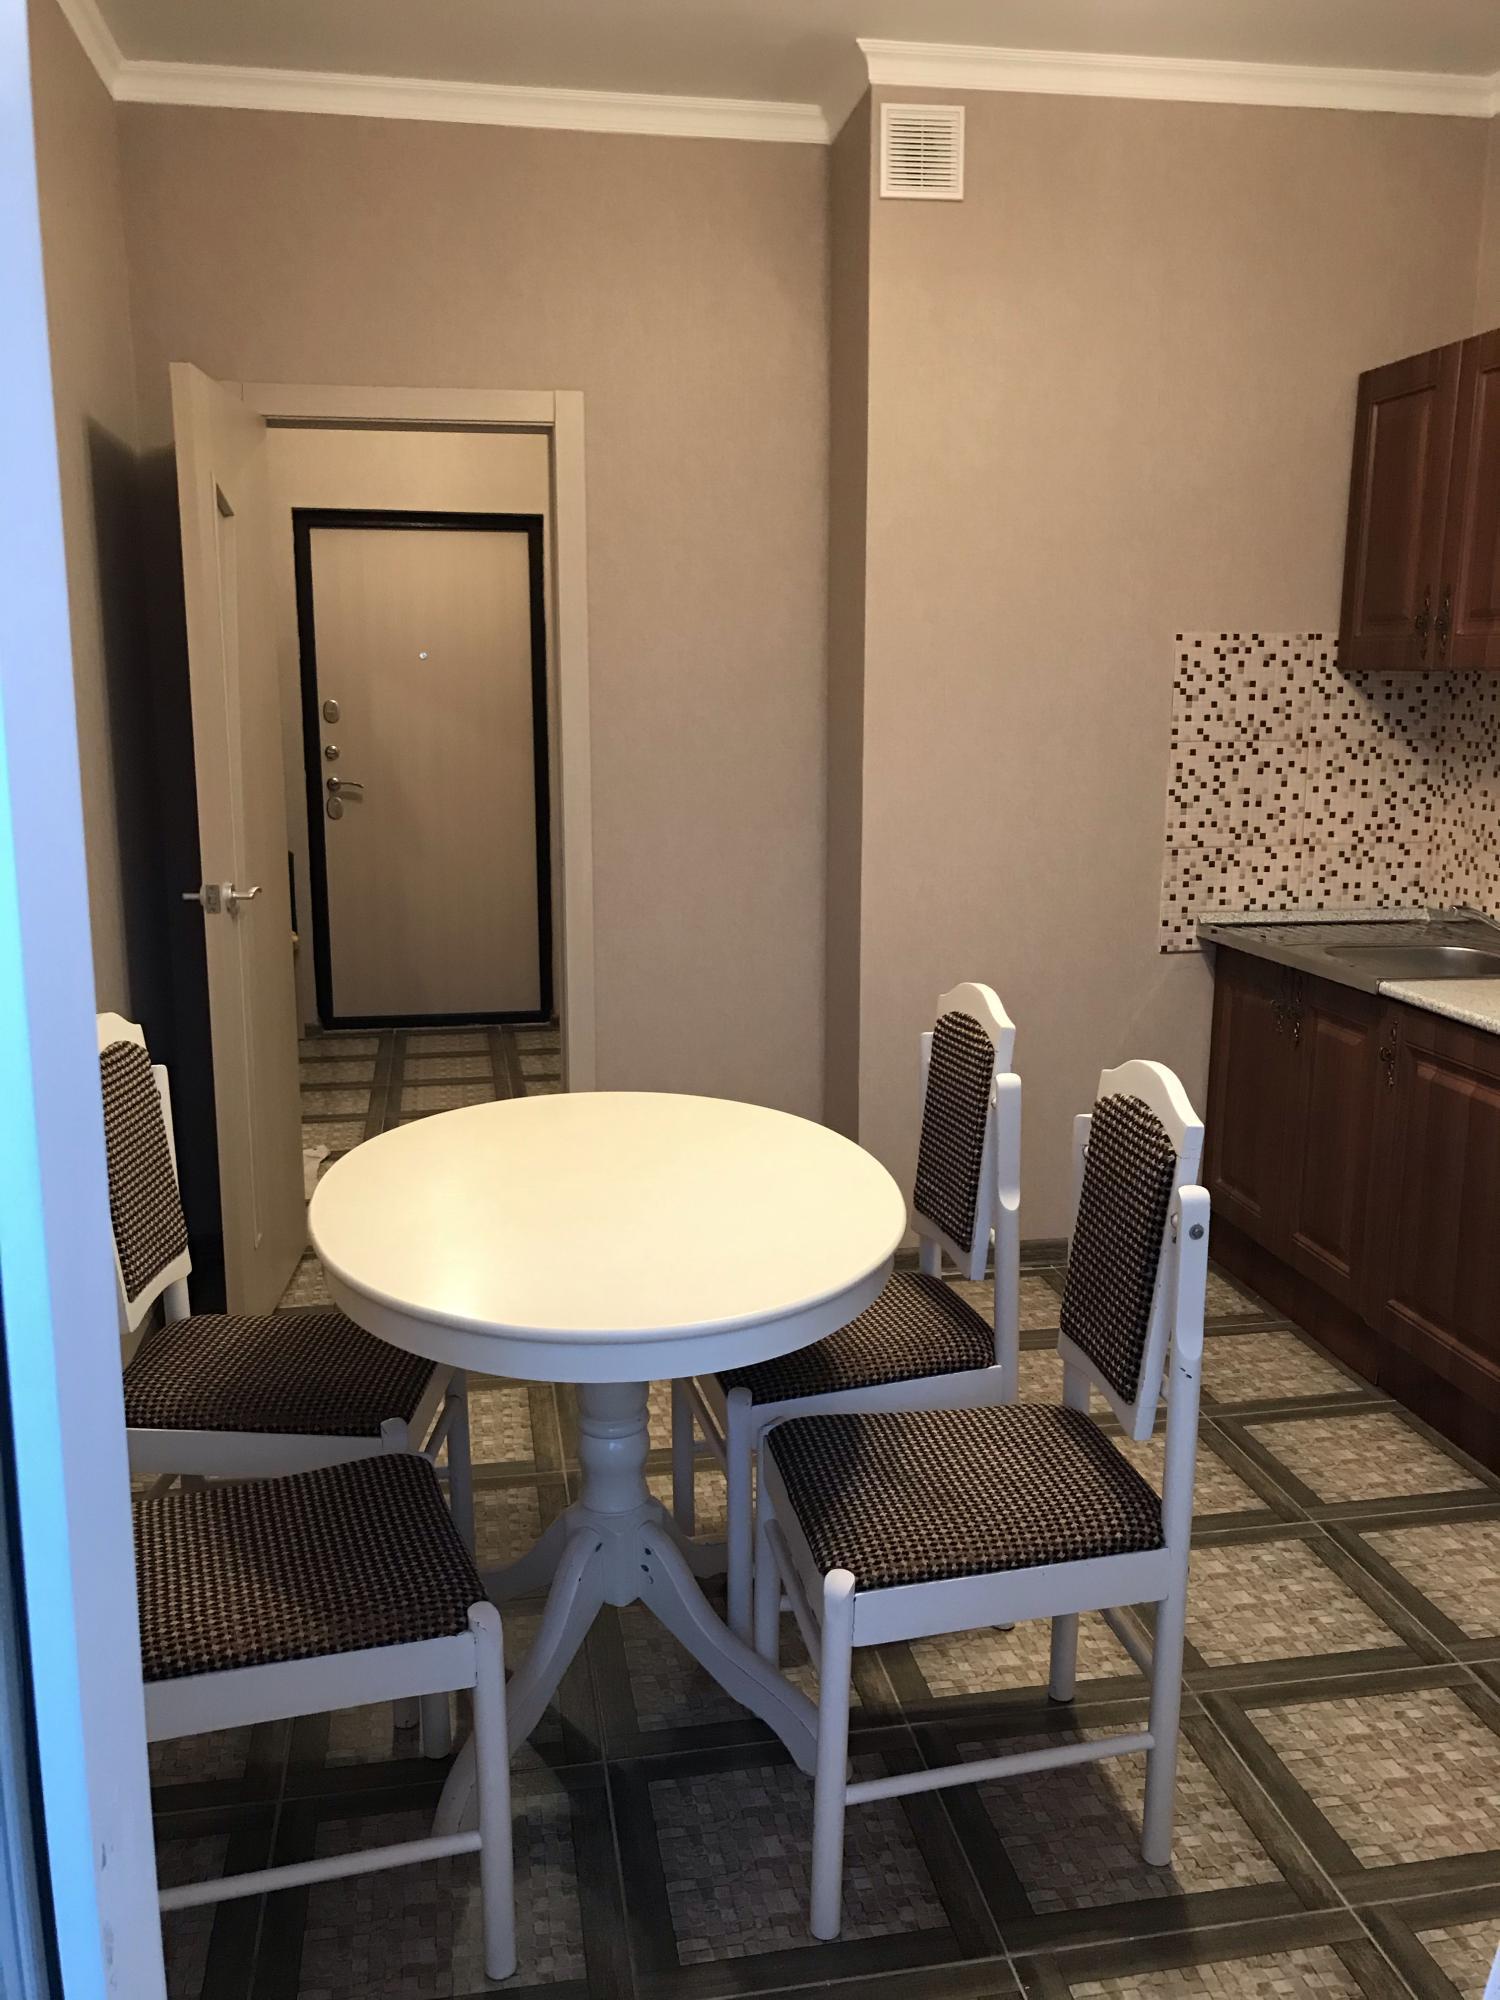 Квартира, 1 комната, 35 м² 89258601492 купить 9